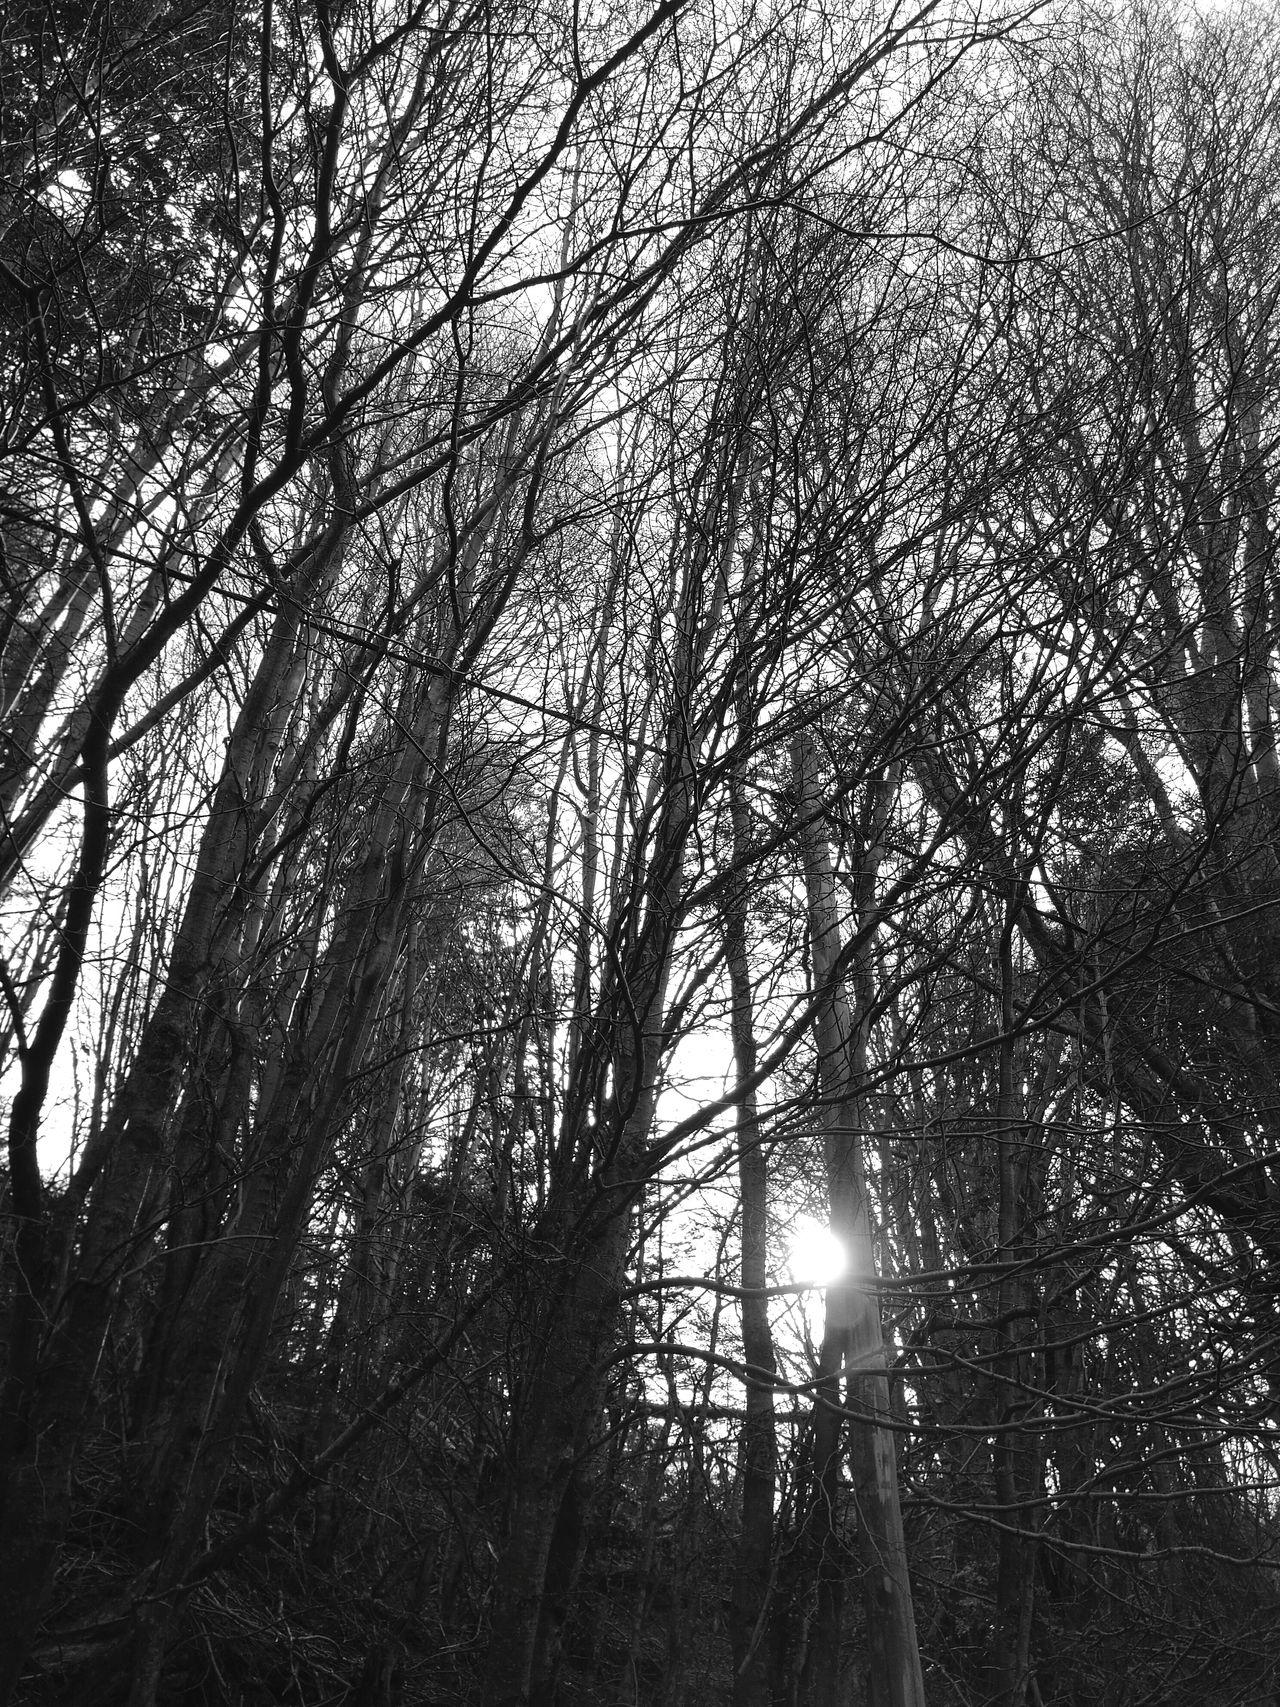 Beauty In Nature Scenics Non-urban Scene Nature Tranquil Scene Bare Tree Low Angle View Forest Tree Blackandwhite Photography Black & White Ushuaia Tierradelfuego Ushuaia Paisaje Argentina 👑🎉🎊👌😚😍 Fin Del Mundo Ushuaïa Ushuaia Arg. Argentina Photography Ushuaia Argentina Argentina Majestic Nature